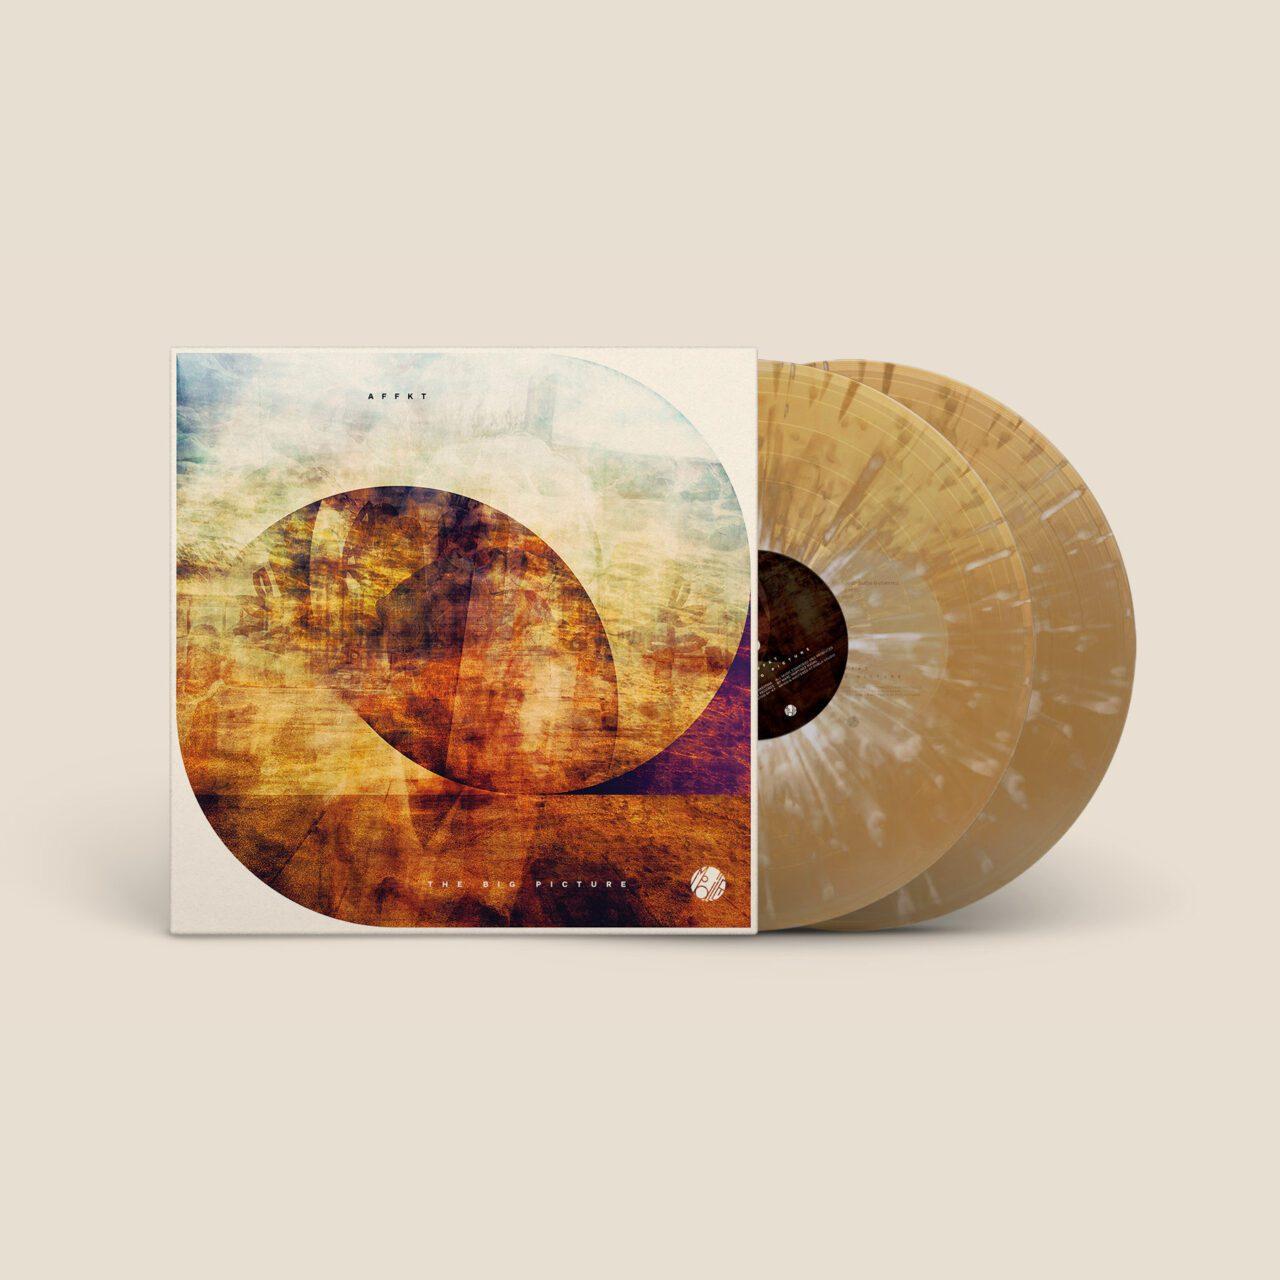 MobileeLP034_AFFKT_TheBigPicture_Vinyl-mockup_1800x1800px